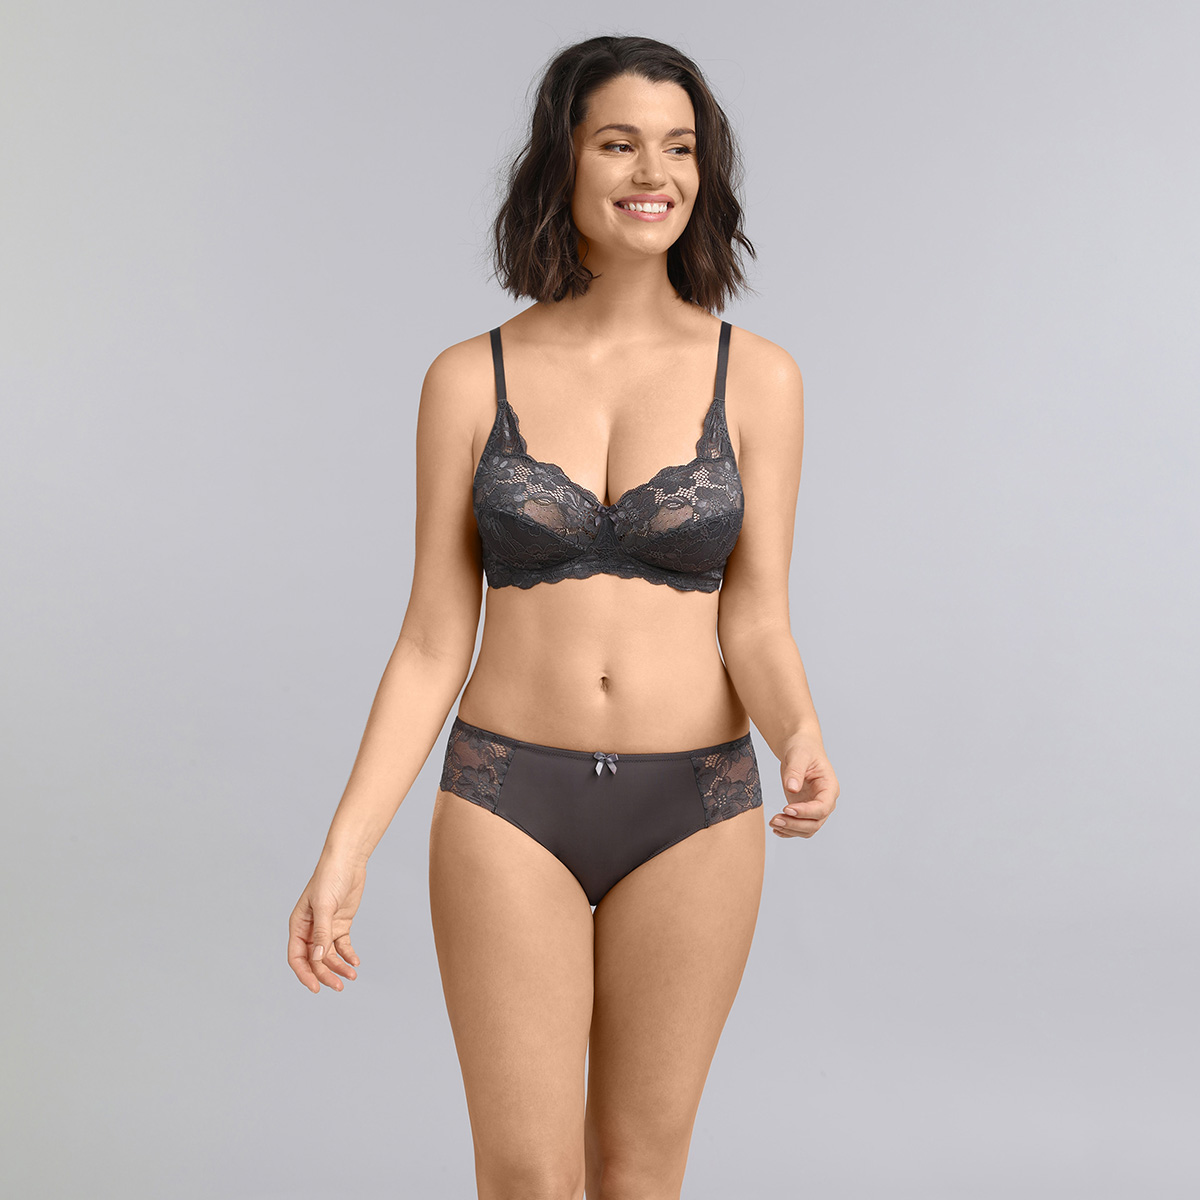 Bikini knickers in grey Essential Elegance , , PLAYTEX